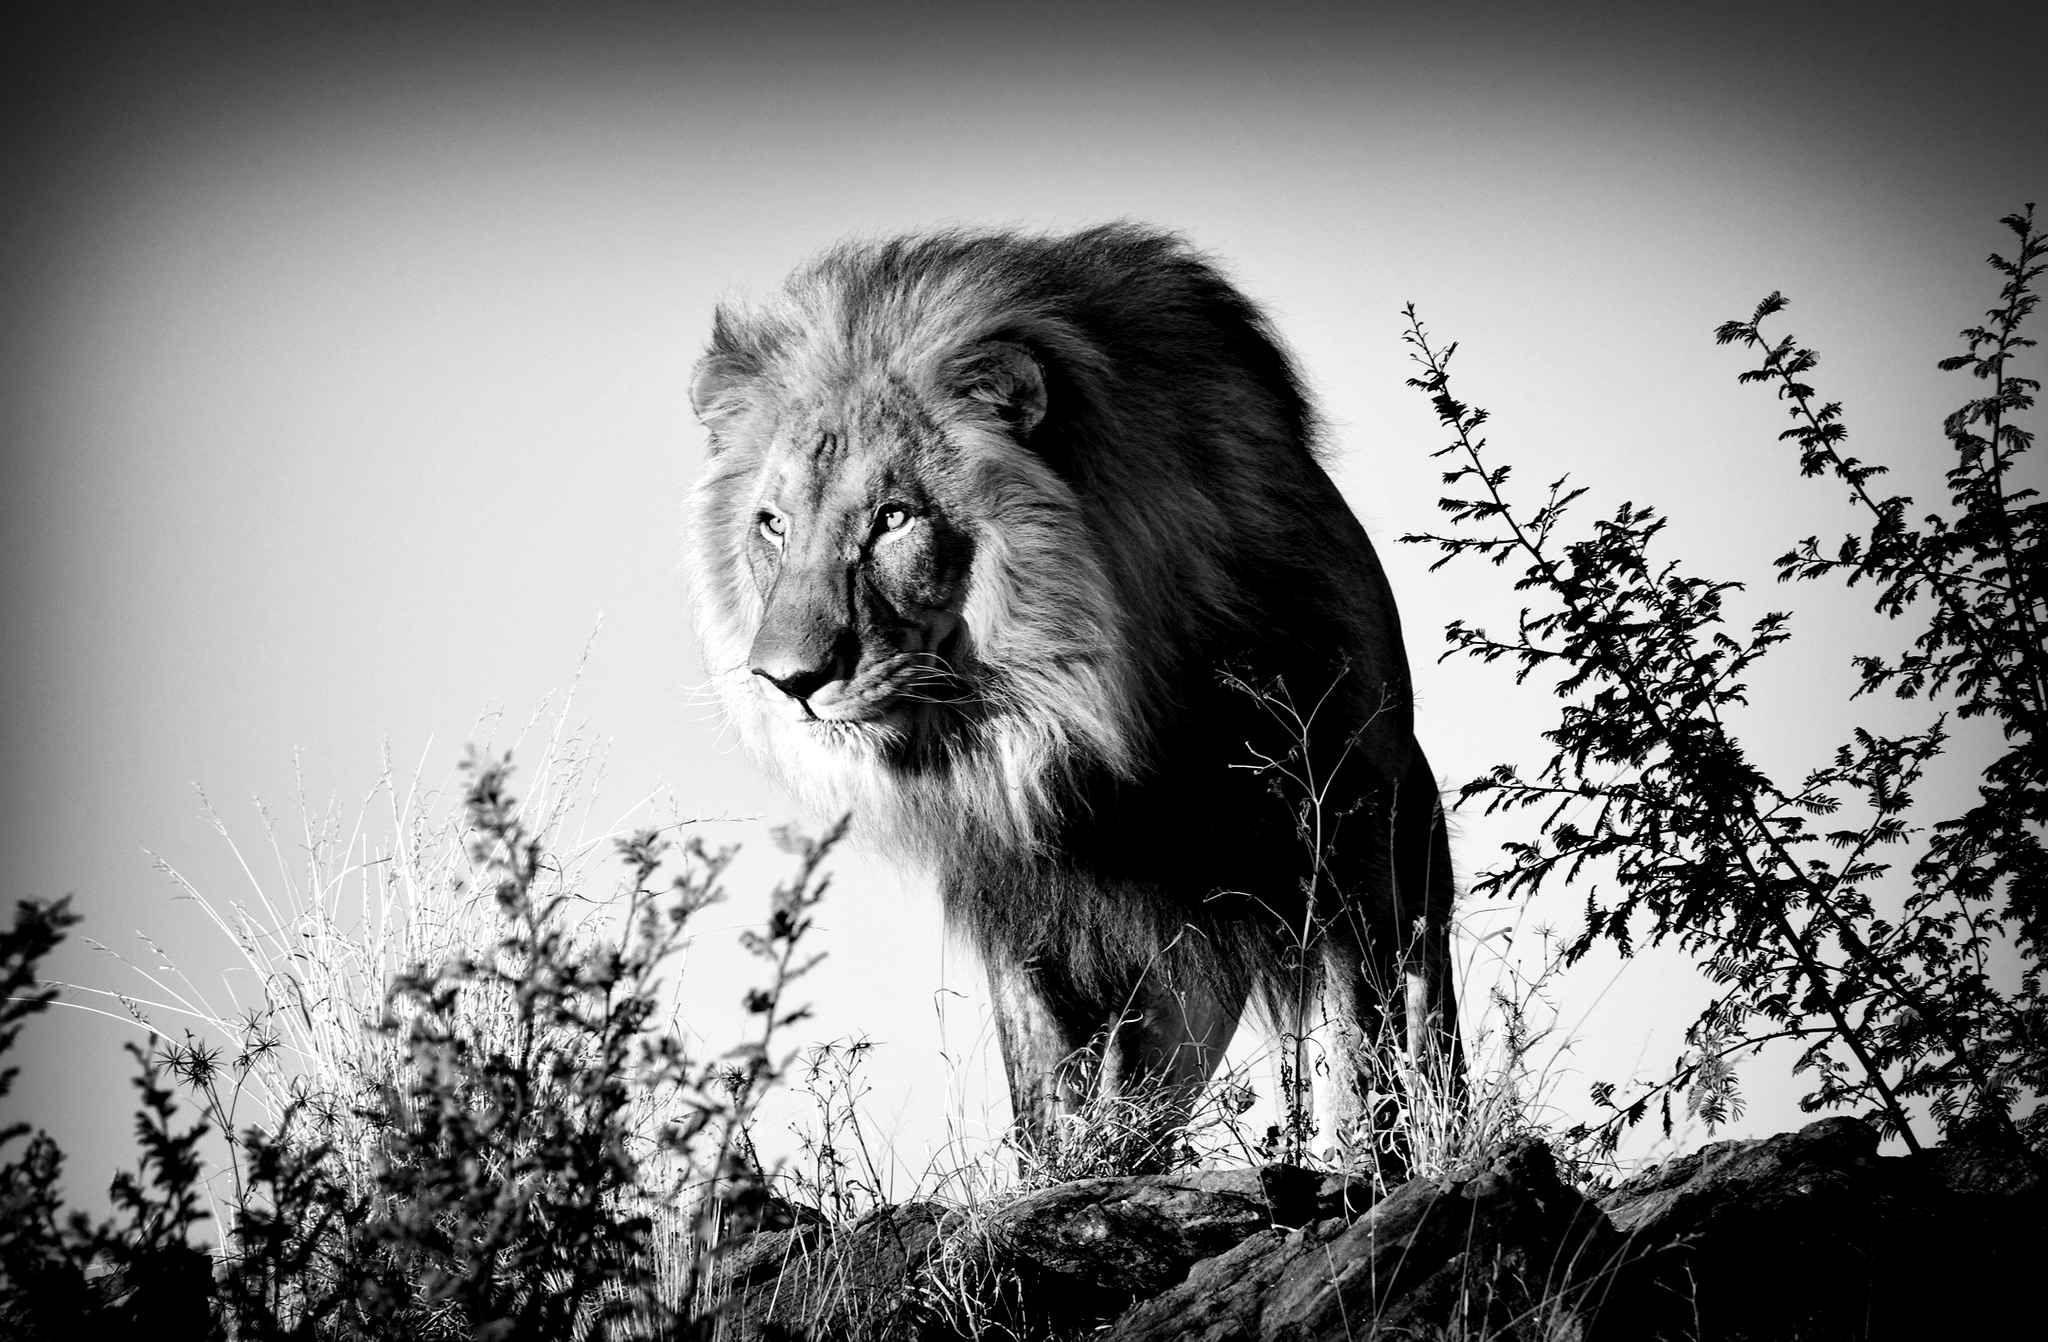 black lion video 1992 imdb - HD2048×1342